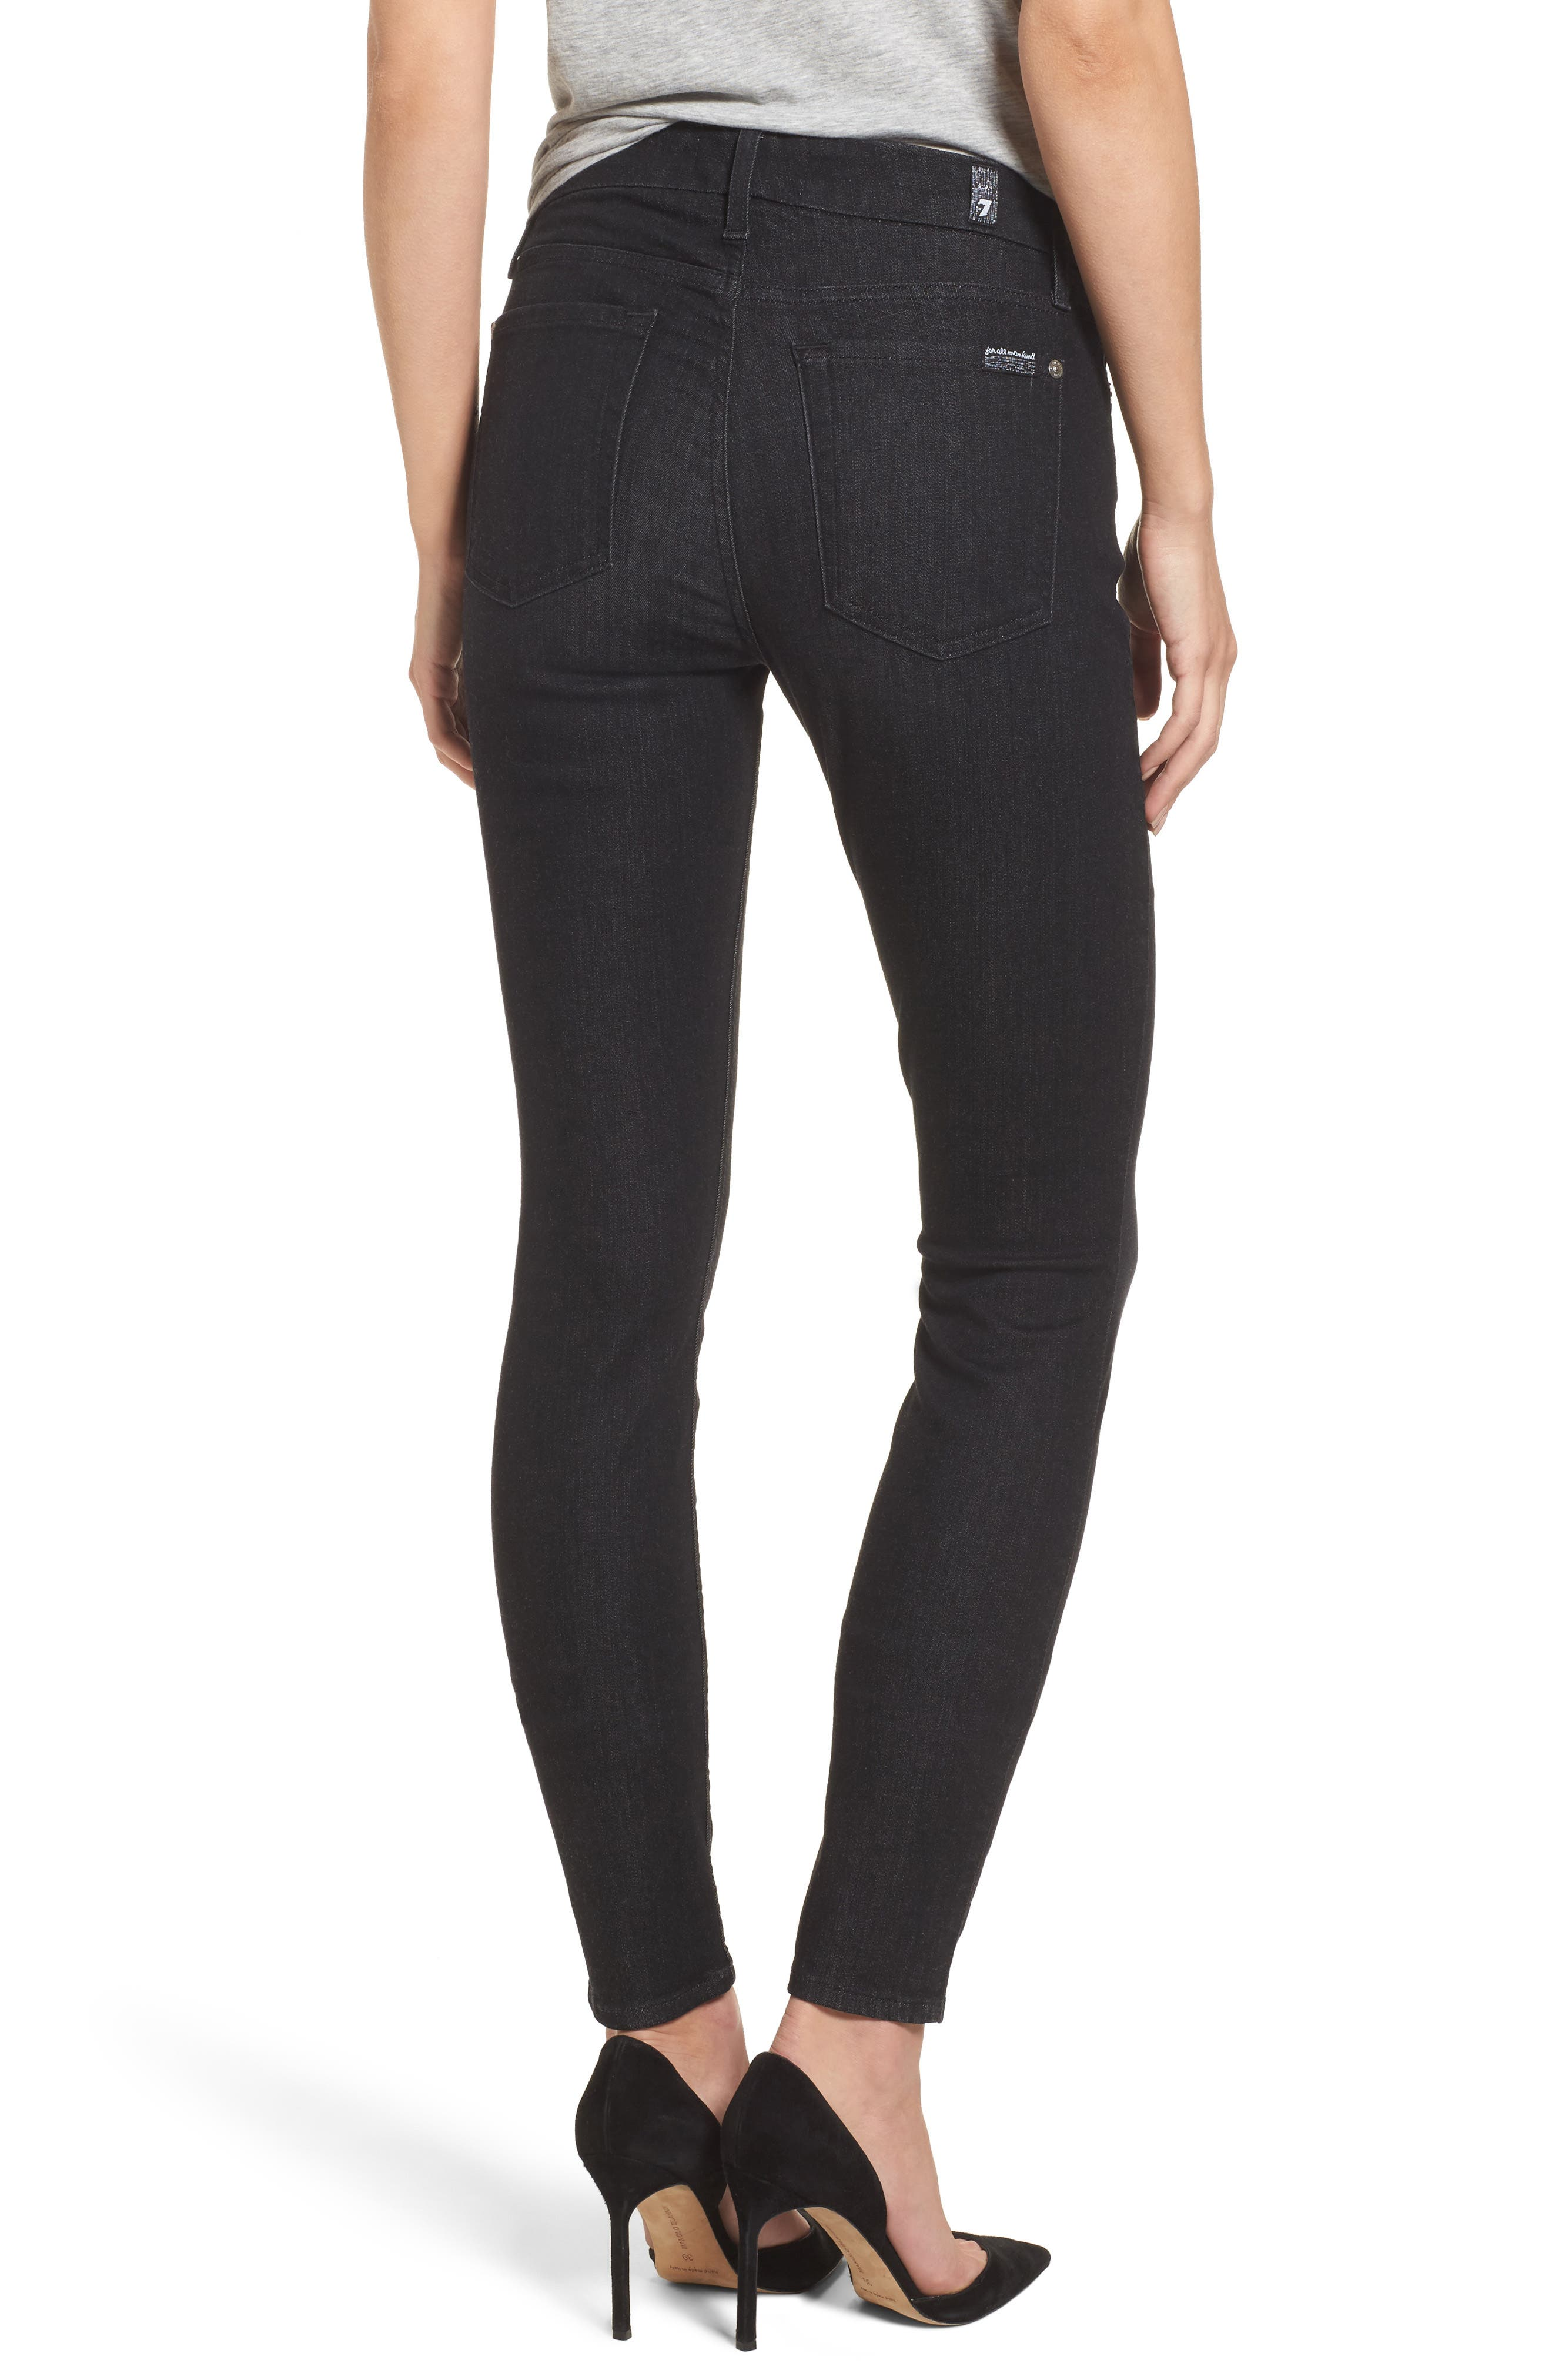 b(air) - The Skinny High Waist Jeans,                             Alternate thumbnail 2, color,                             Bair Noir